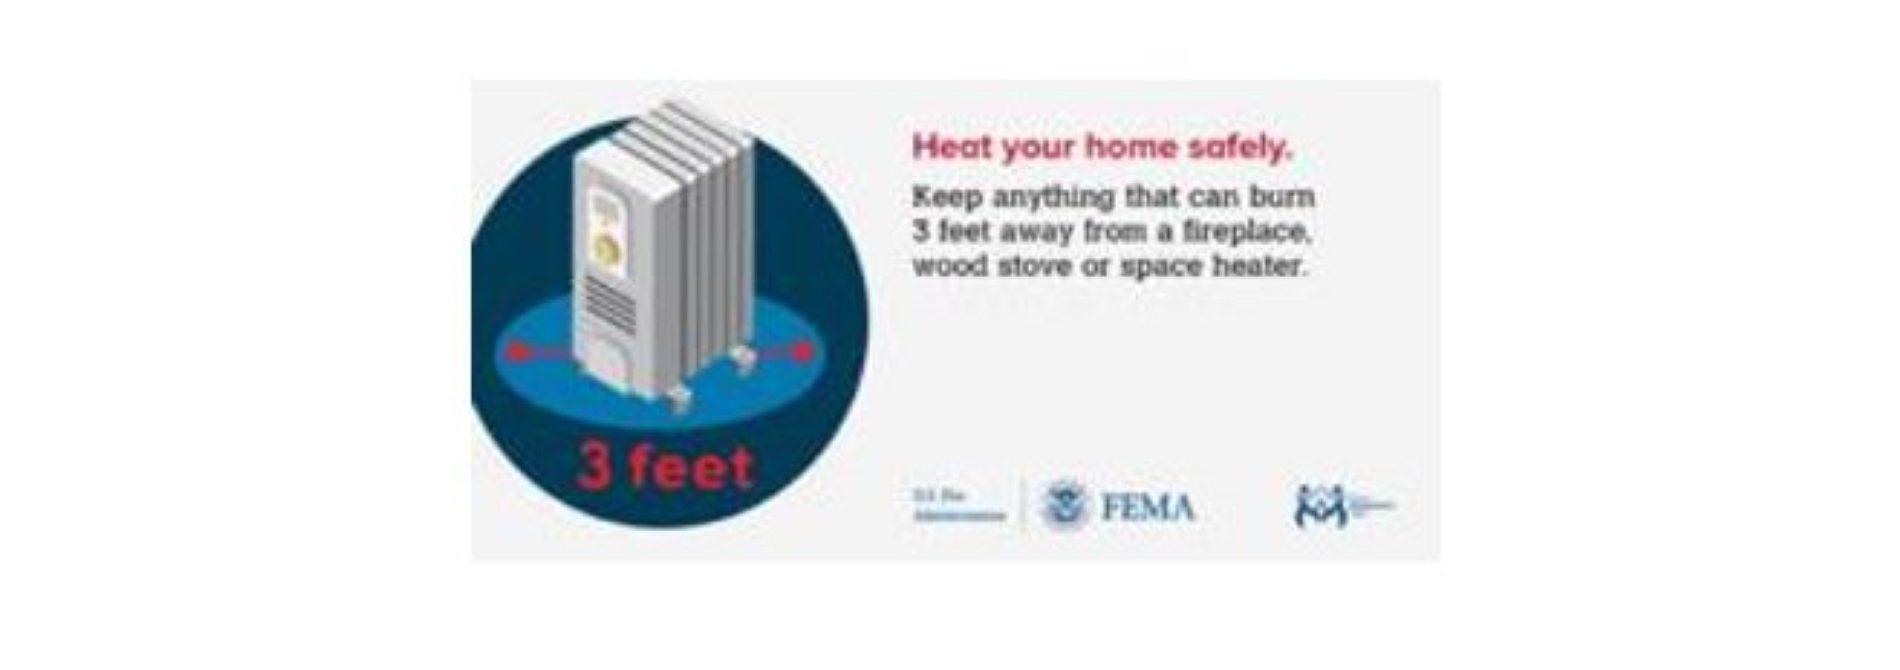 home-heating-image